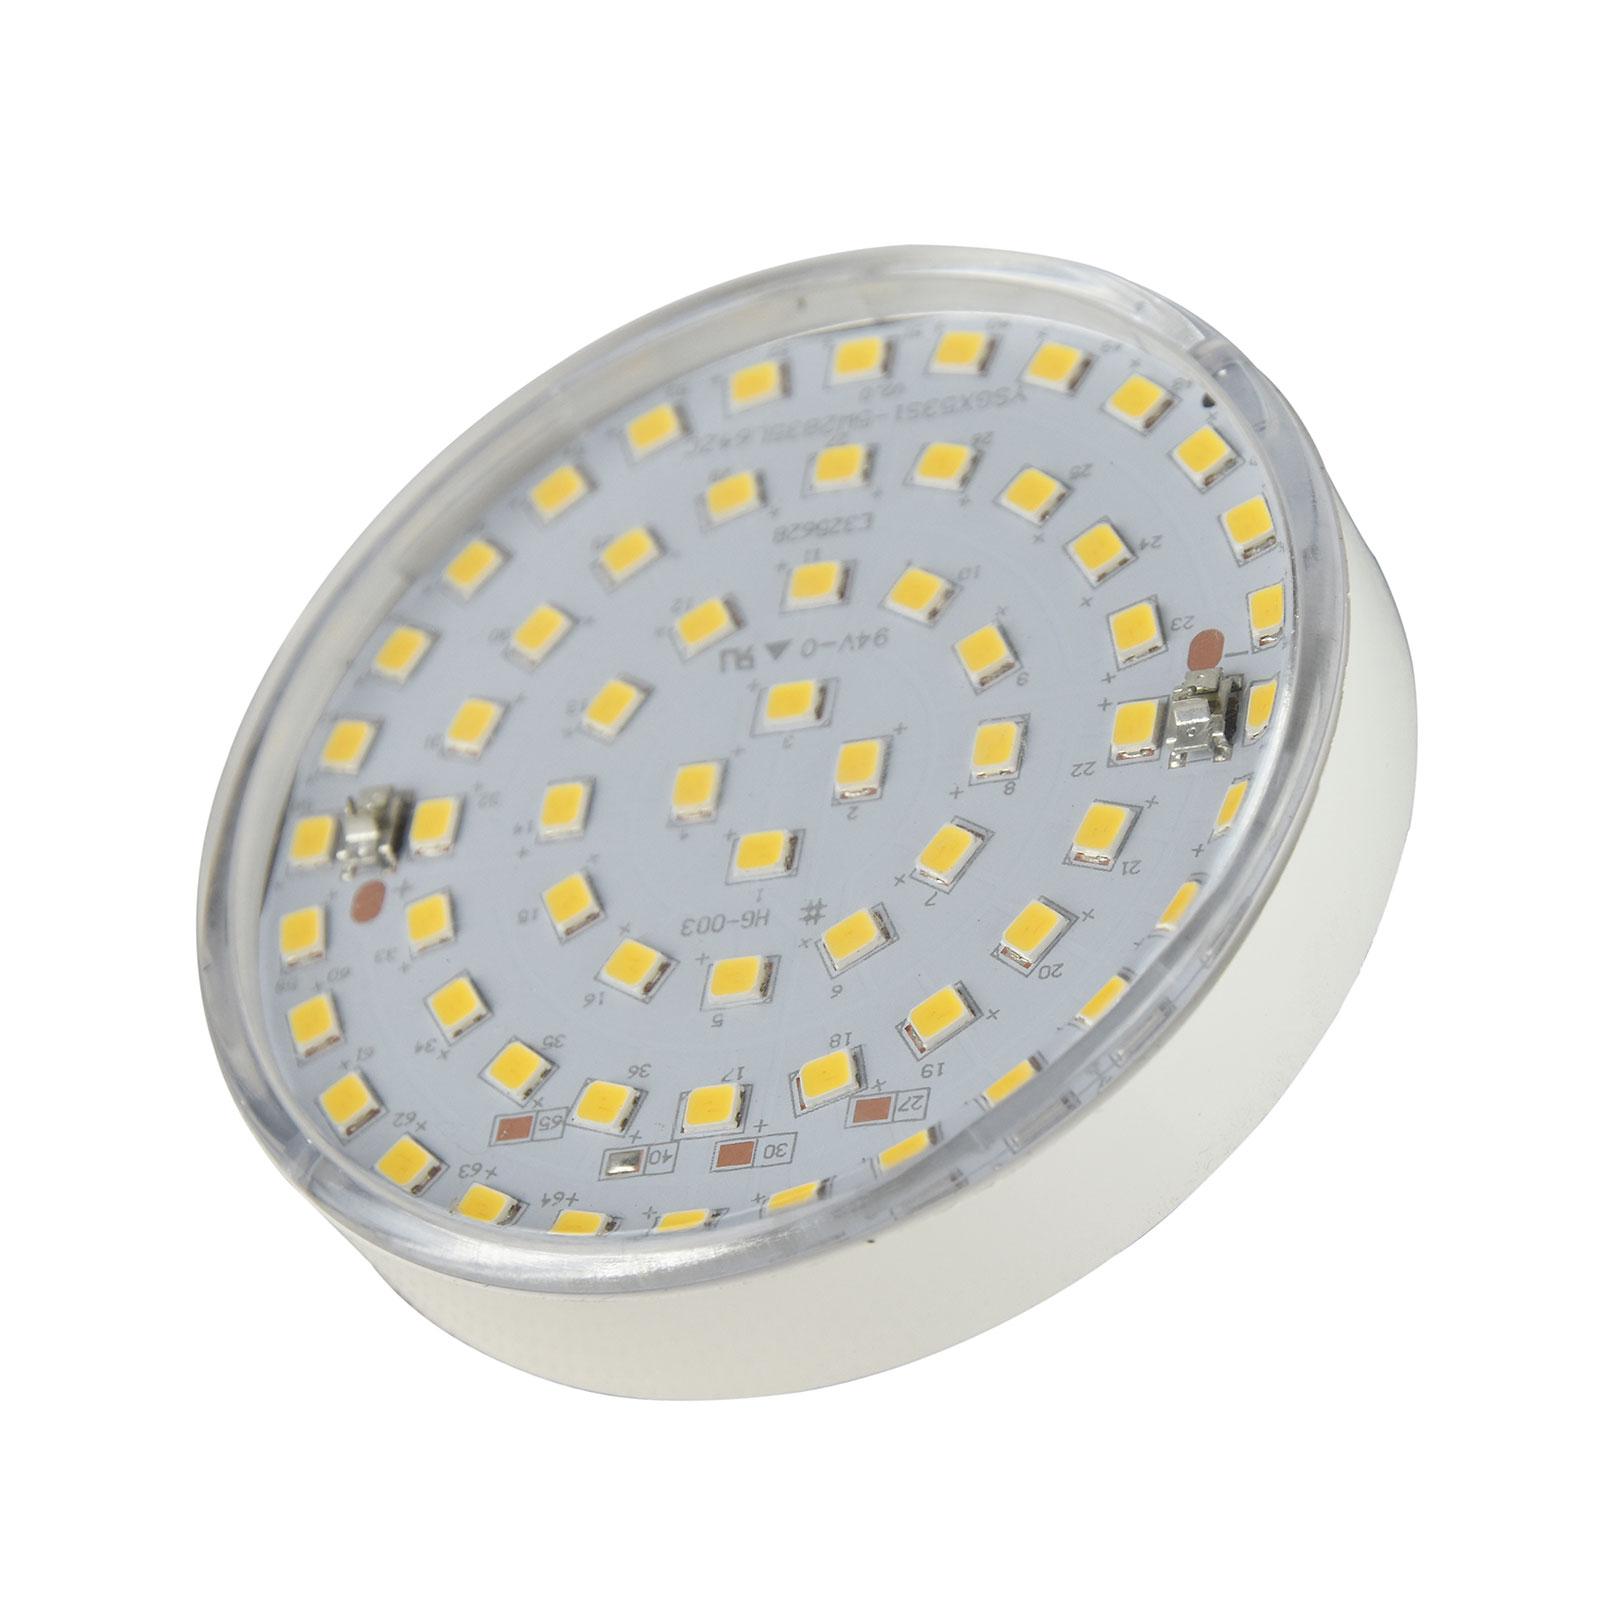 Heldere GX53-ledlamp Micro-Lynx Sylvania, 3W, 830